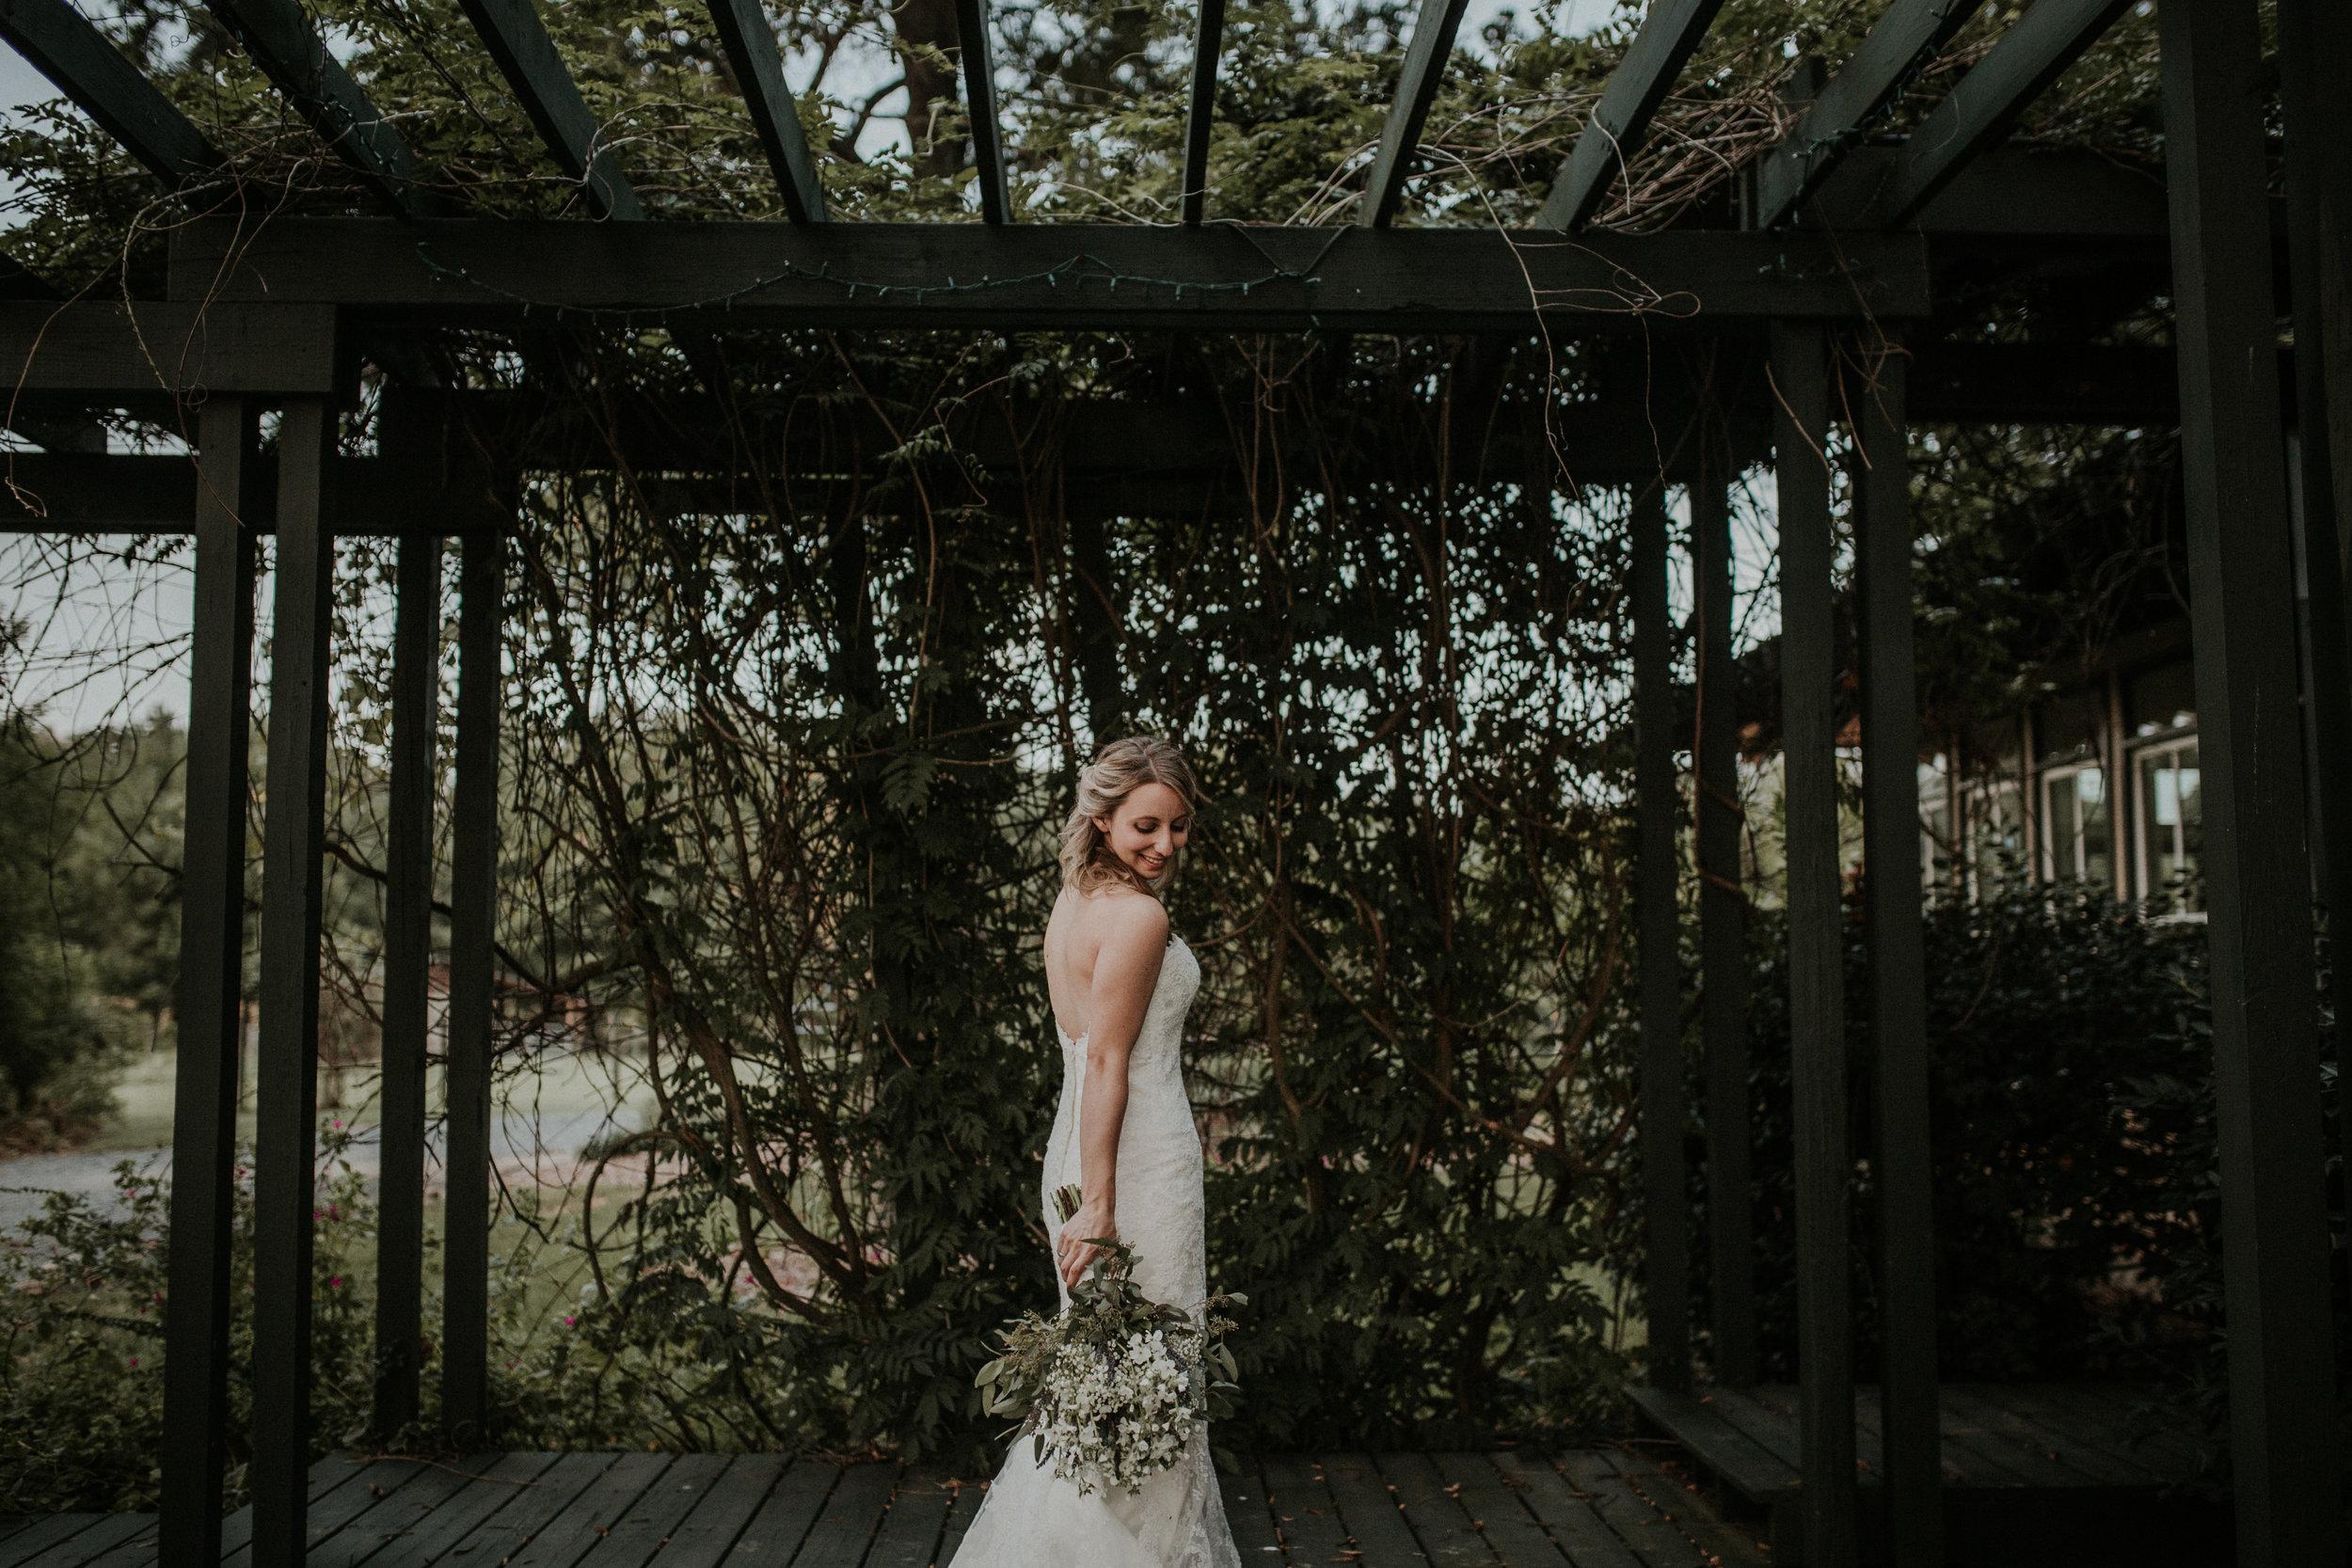 charlotte-wedding-photographer-daniel-stowe-2517.jpg